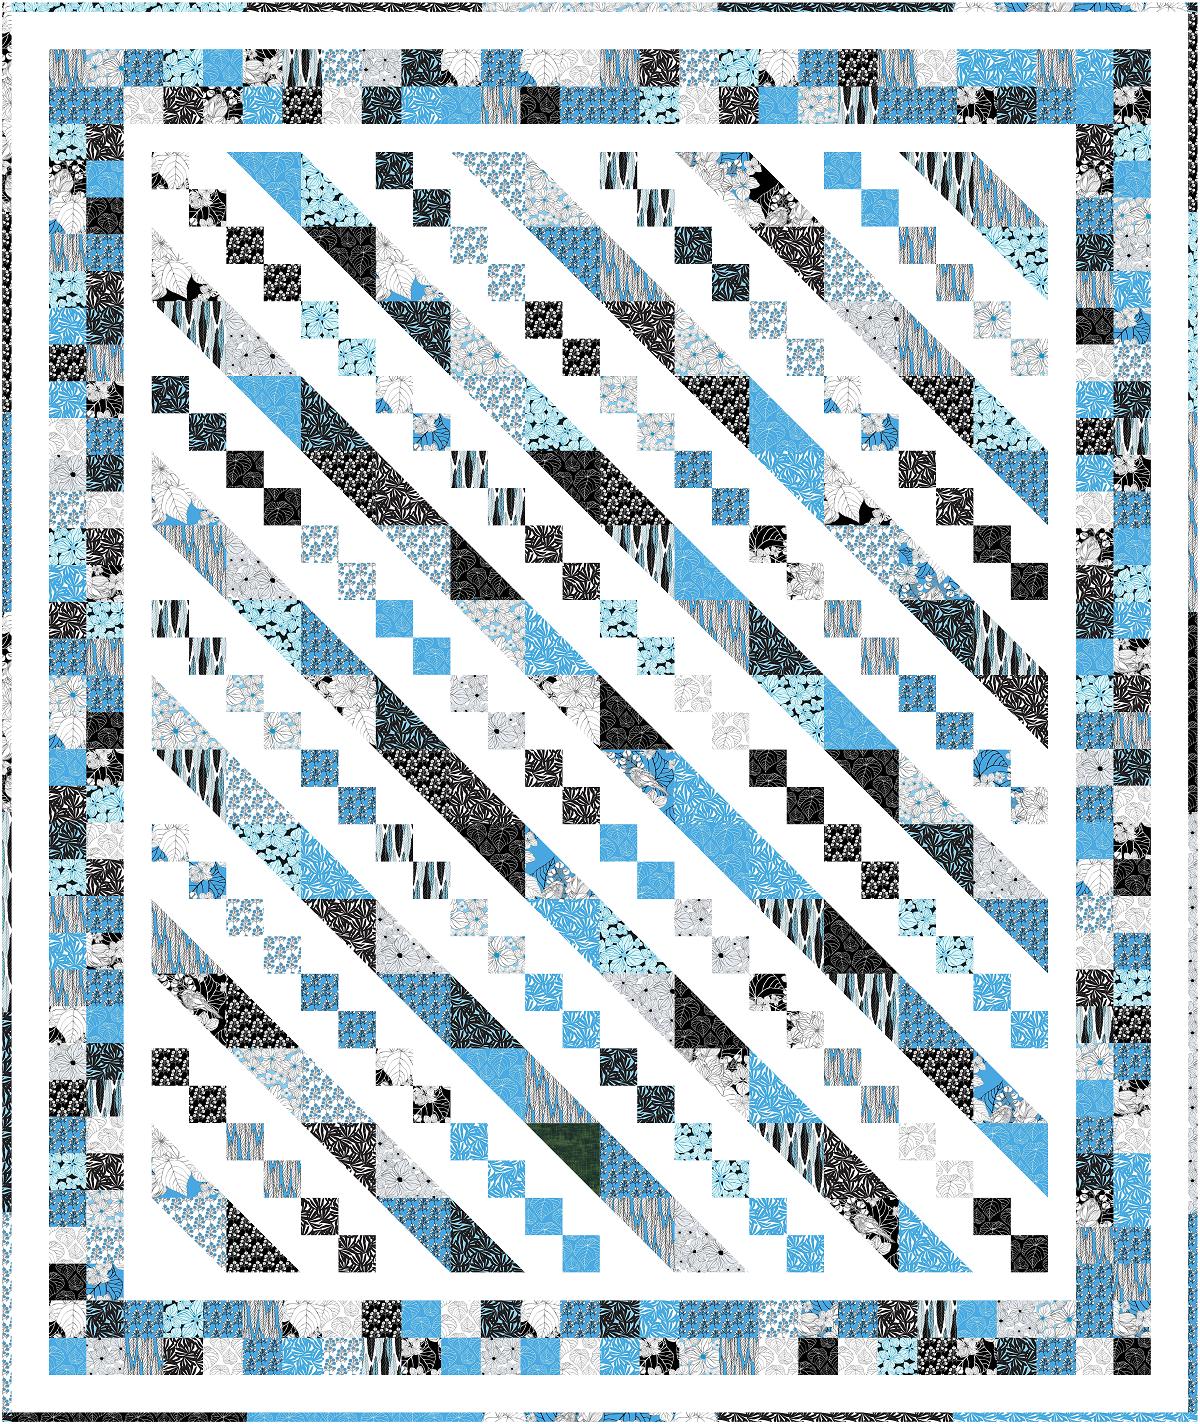 Ivory Woods -  Steps and Slides Quilt Kit - 63 x 75